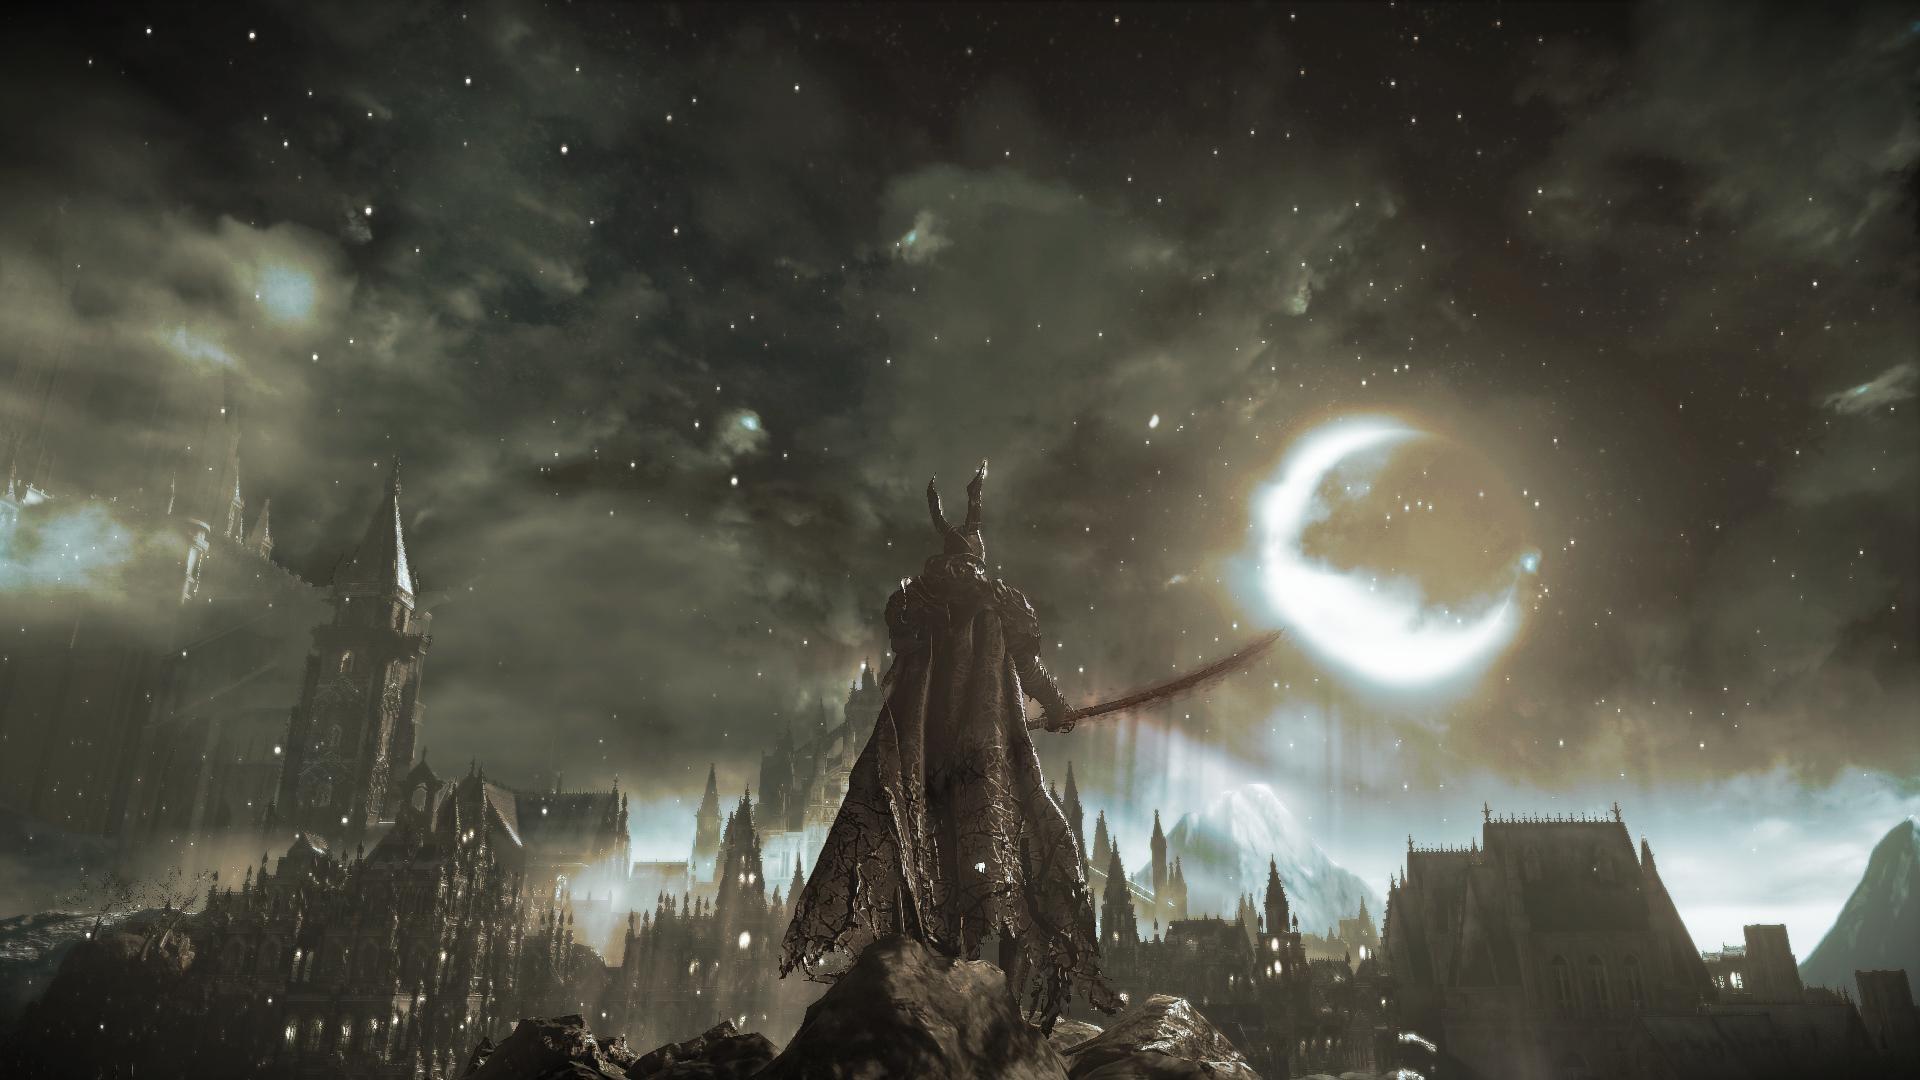 Dark Souls 3 Wallpaper, Concept Art Downloads ThemePack